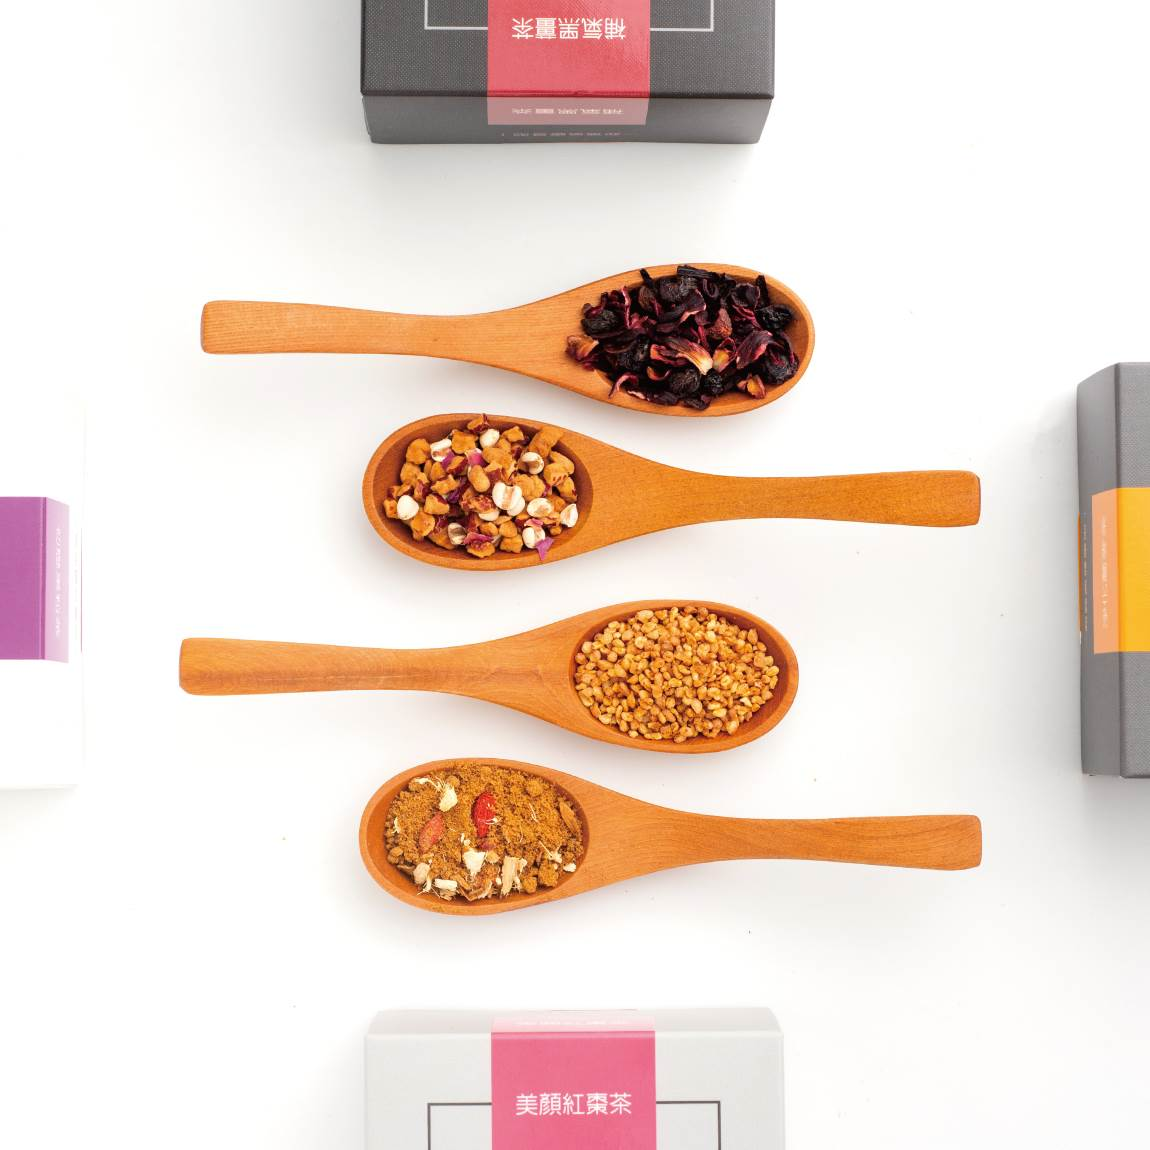 VitaCodes美顏茶-產品介紹04-6-美顏茶散茶